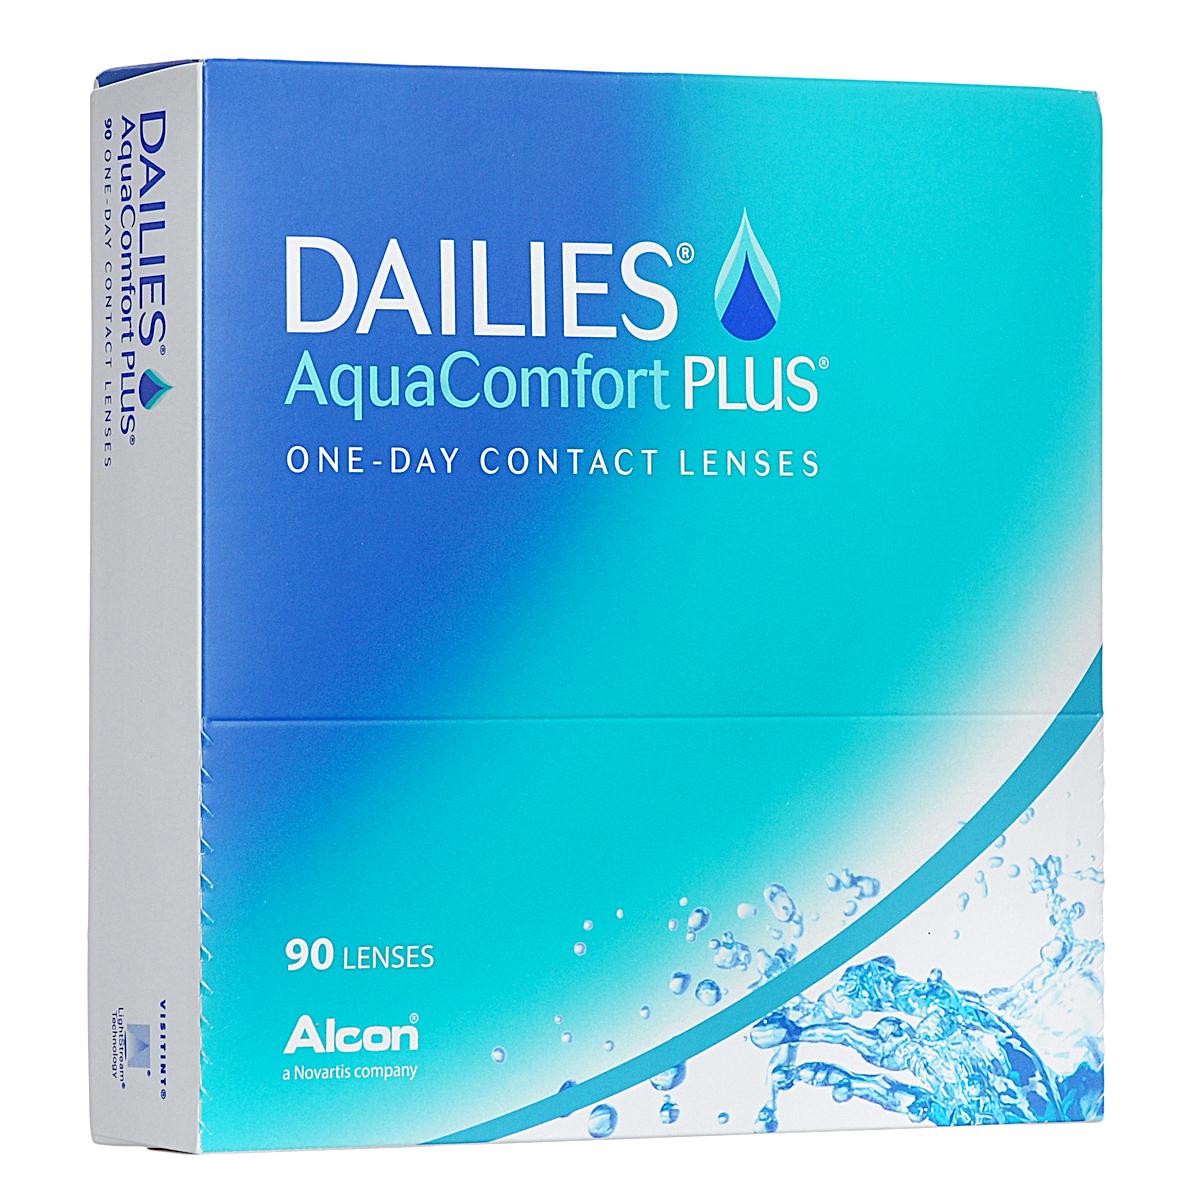 Alcon-CIBA Vision контактные линзы Dailies AquaComfort Plus (90шт / 8.7 / 14.0 / -6.00) объективы и линзы